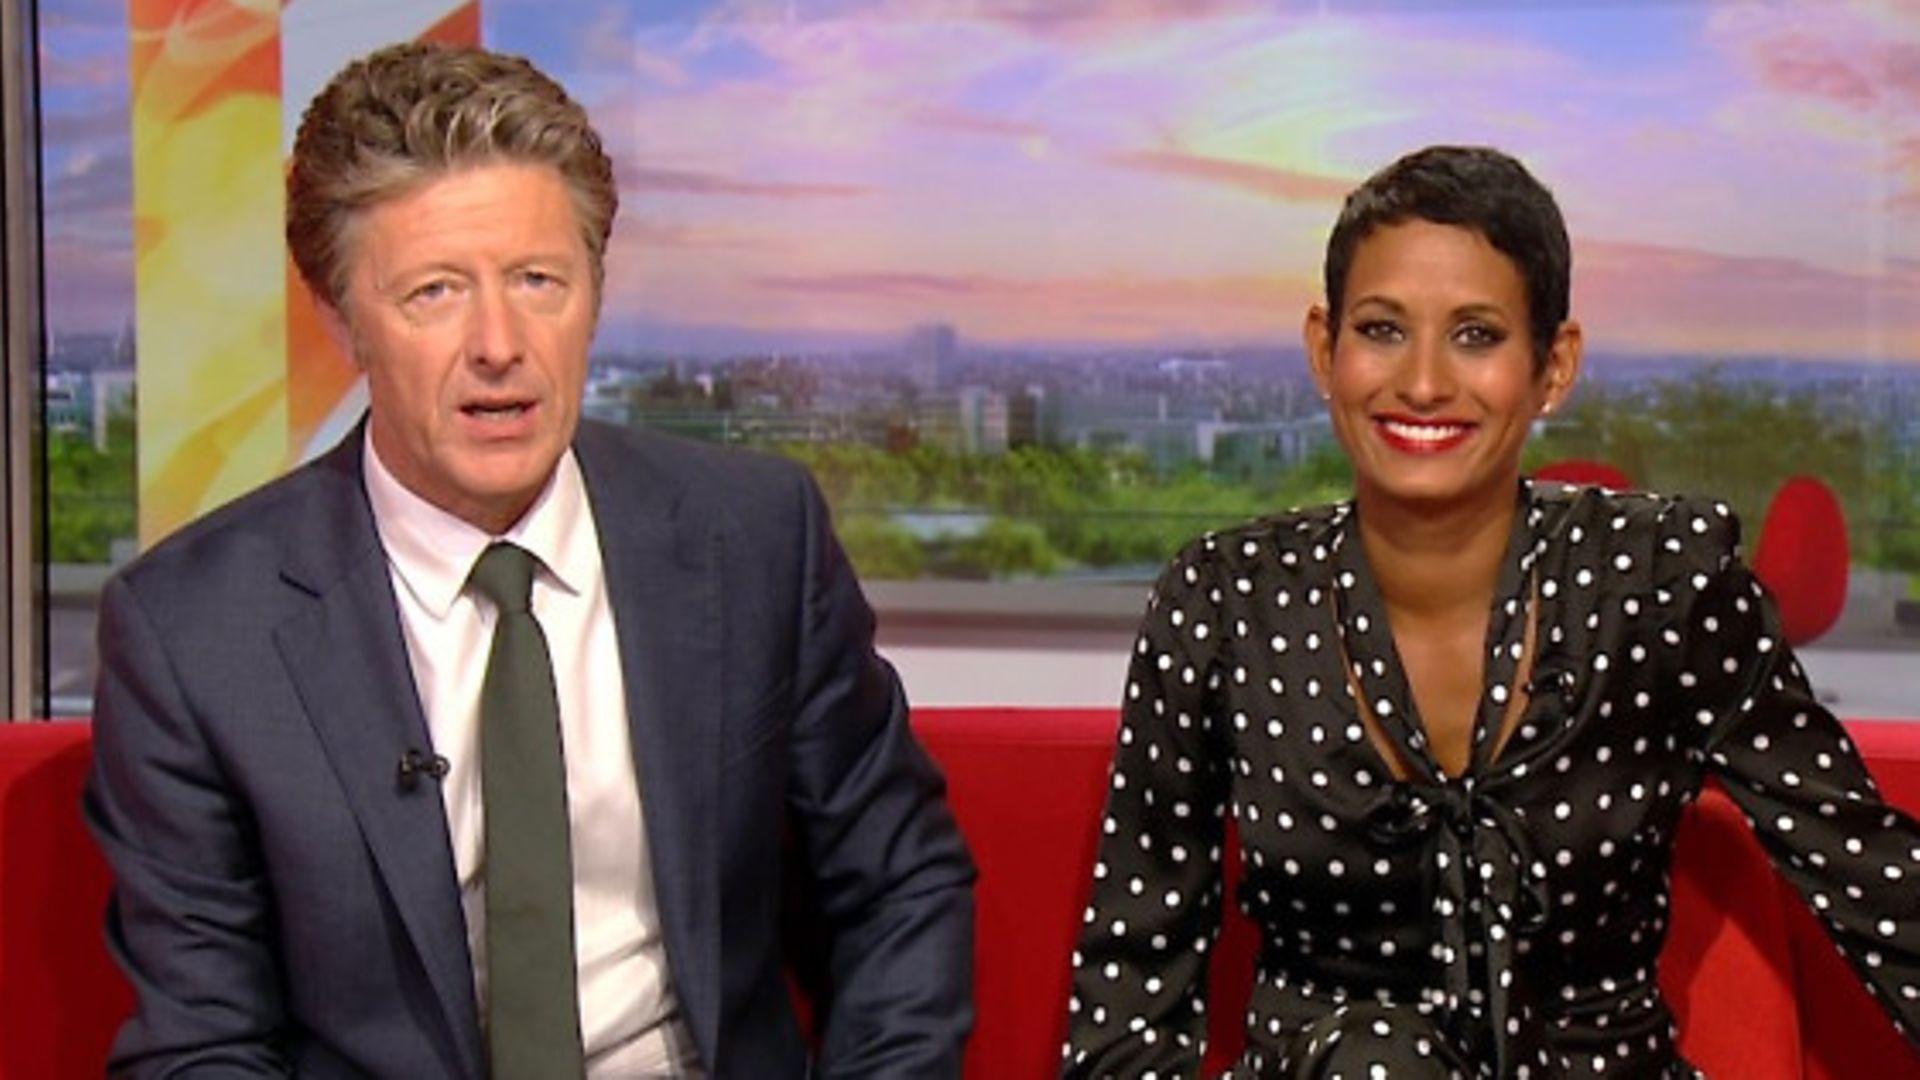 Charlie Stayt and Naga Munchetty - Credit: BBC